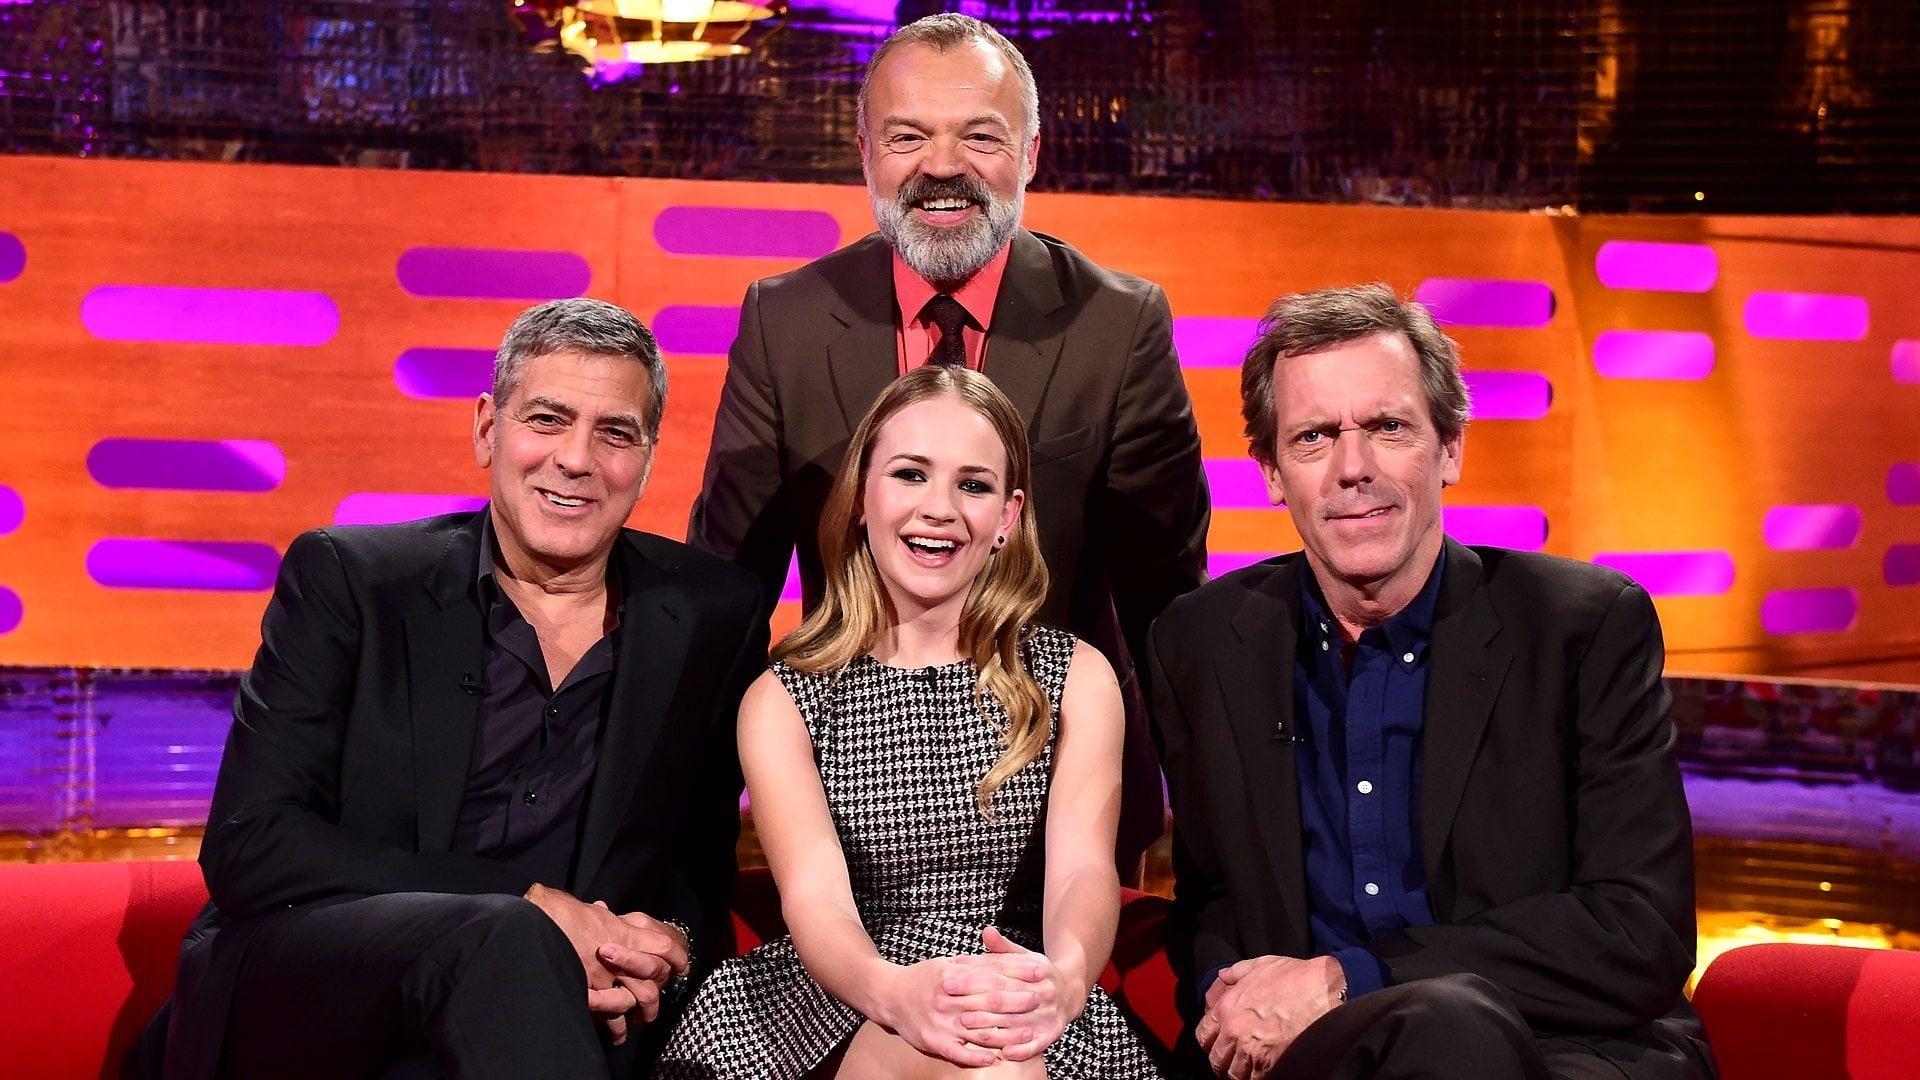 The Graham Norton Show Season 17 :Episode 7  George Clooney, Dwayne 'The Rock' Johnson, Sharon and Ozzy Osbourne, Snoop Dogg